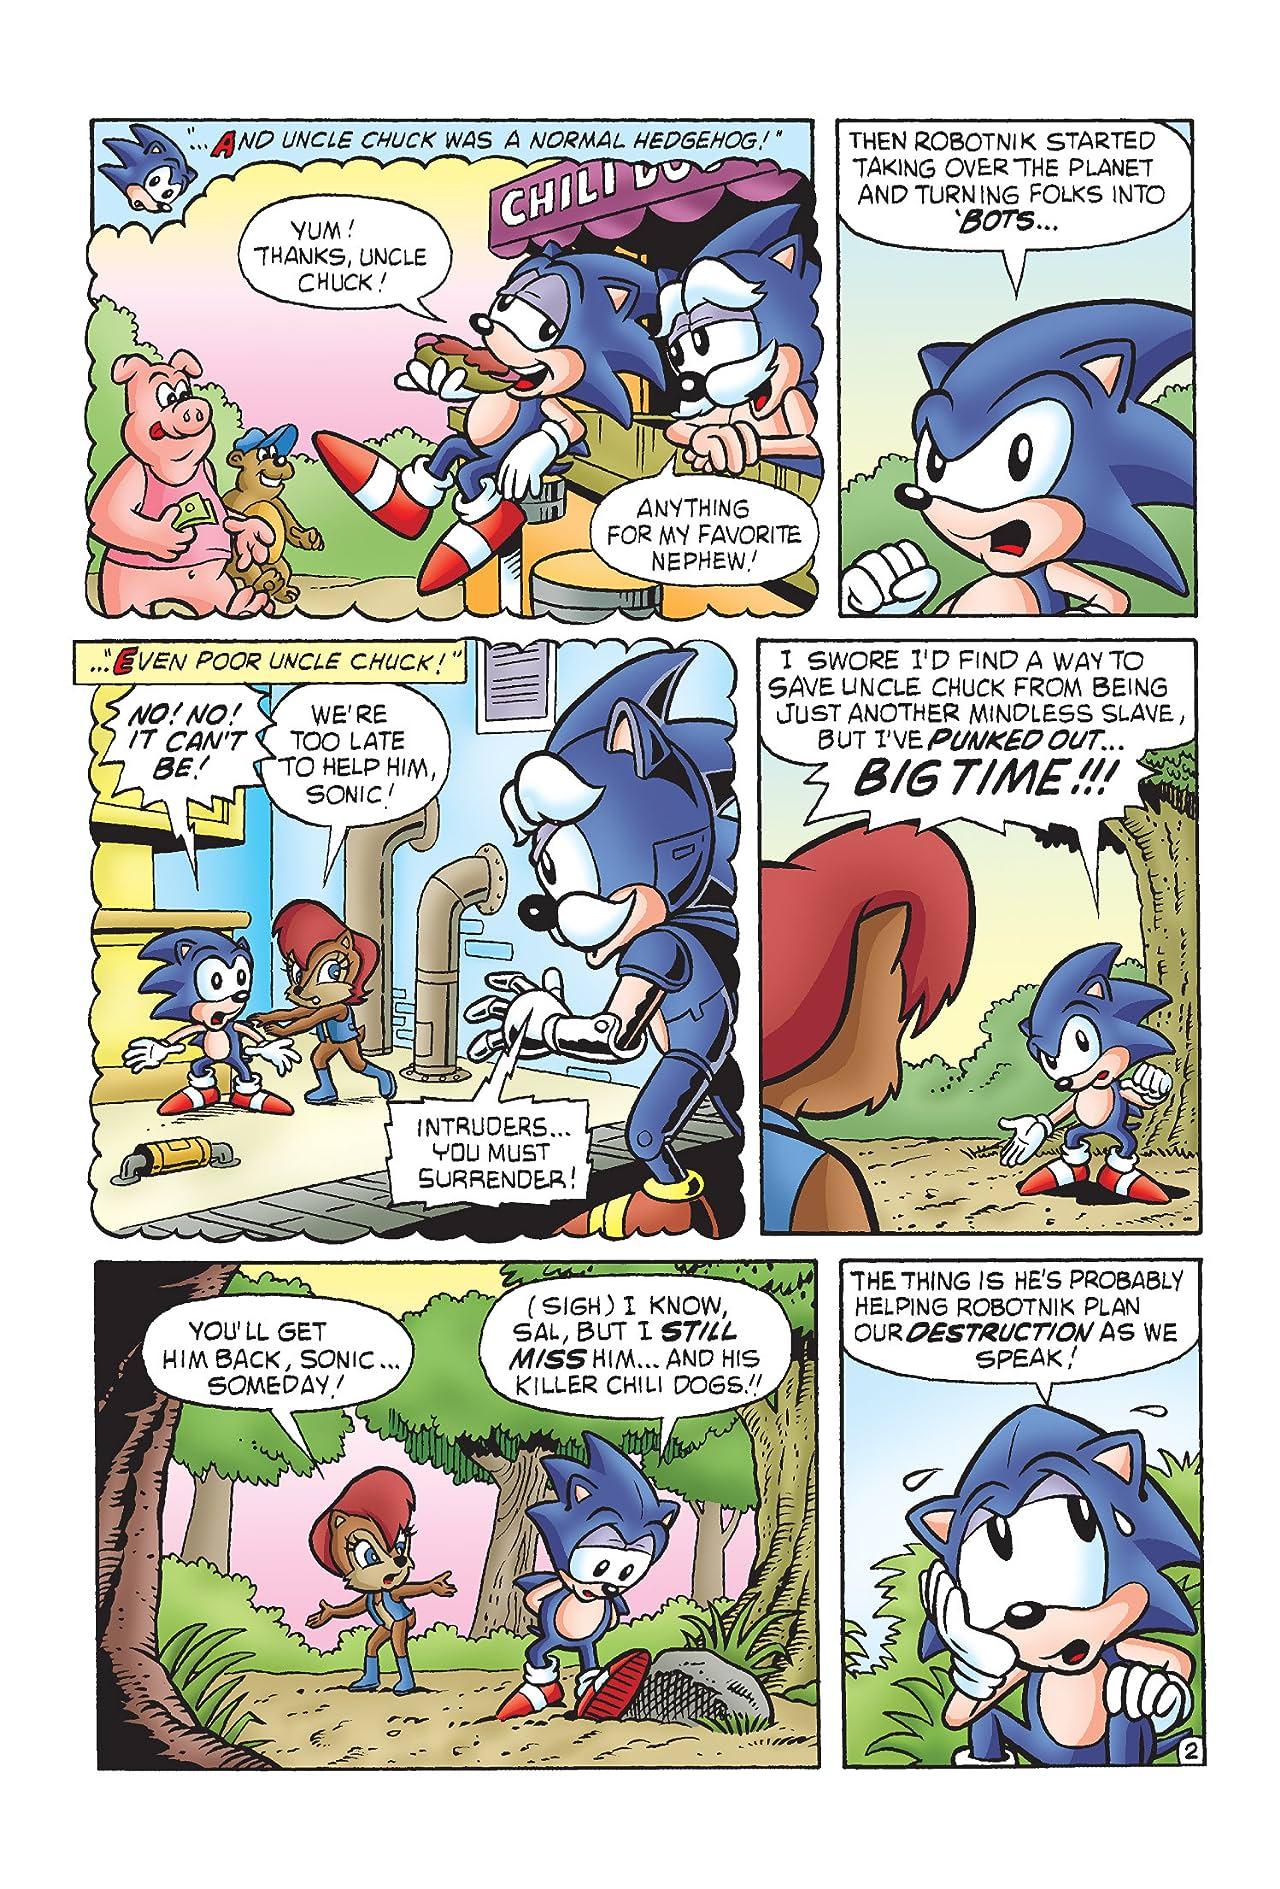 Sonic the Hedgehog #30